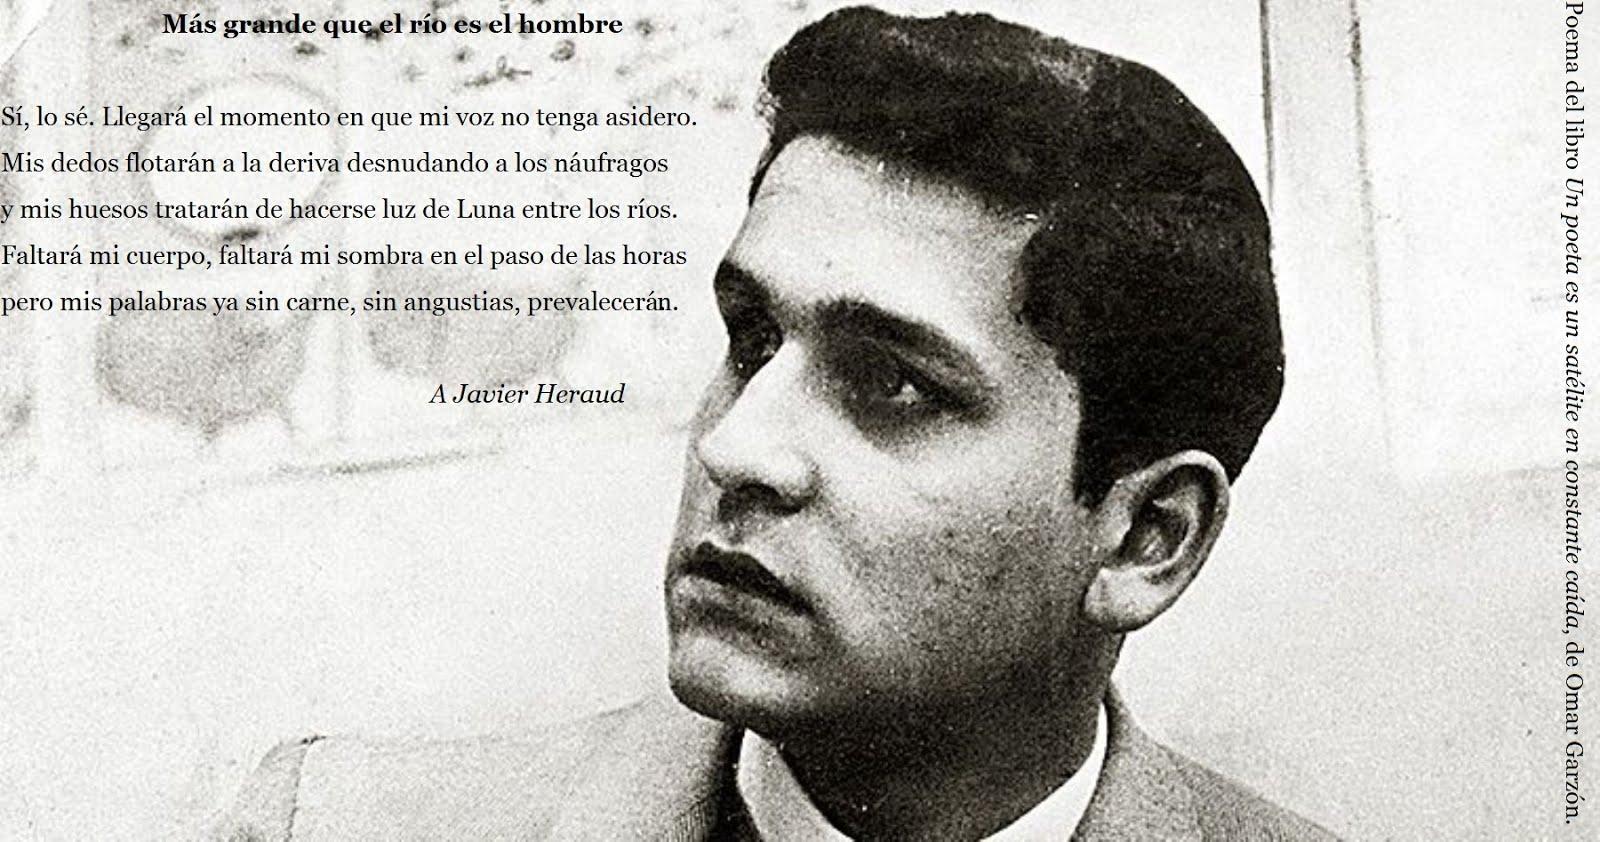 Poema dedicado a Javier Heraud